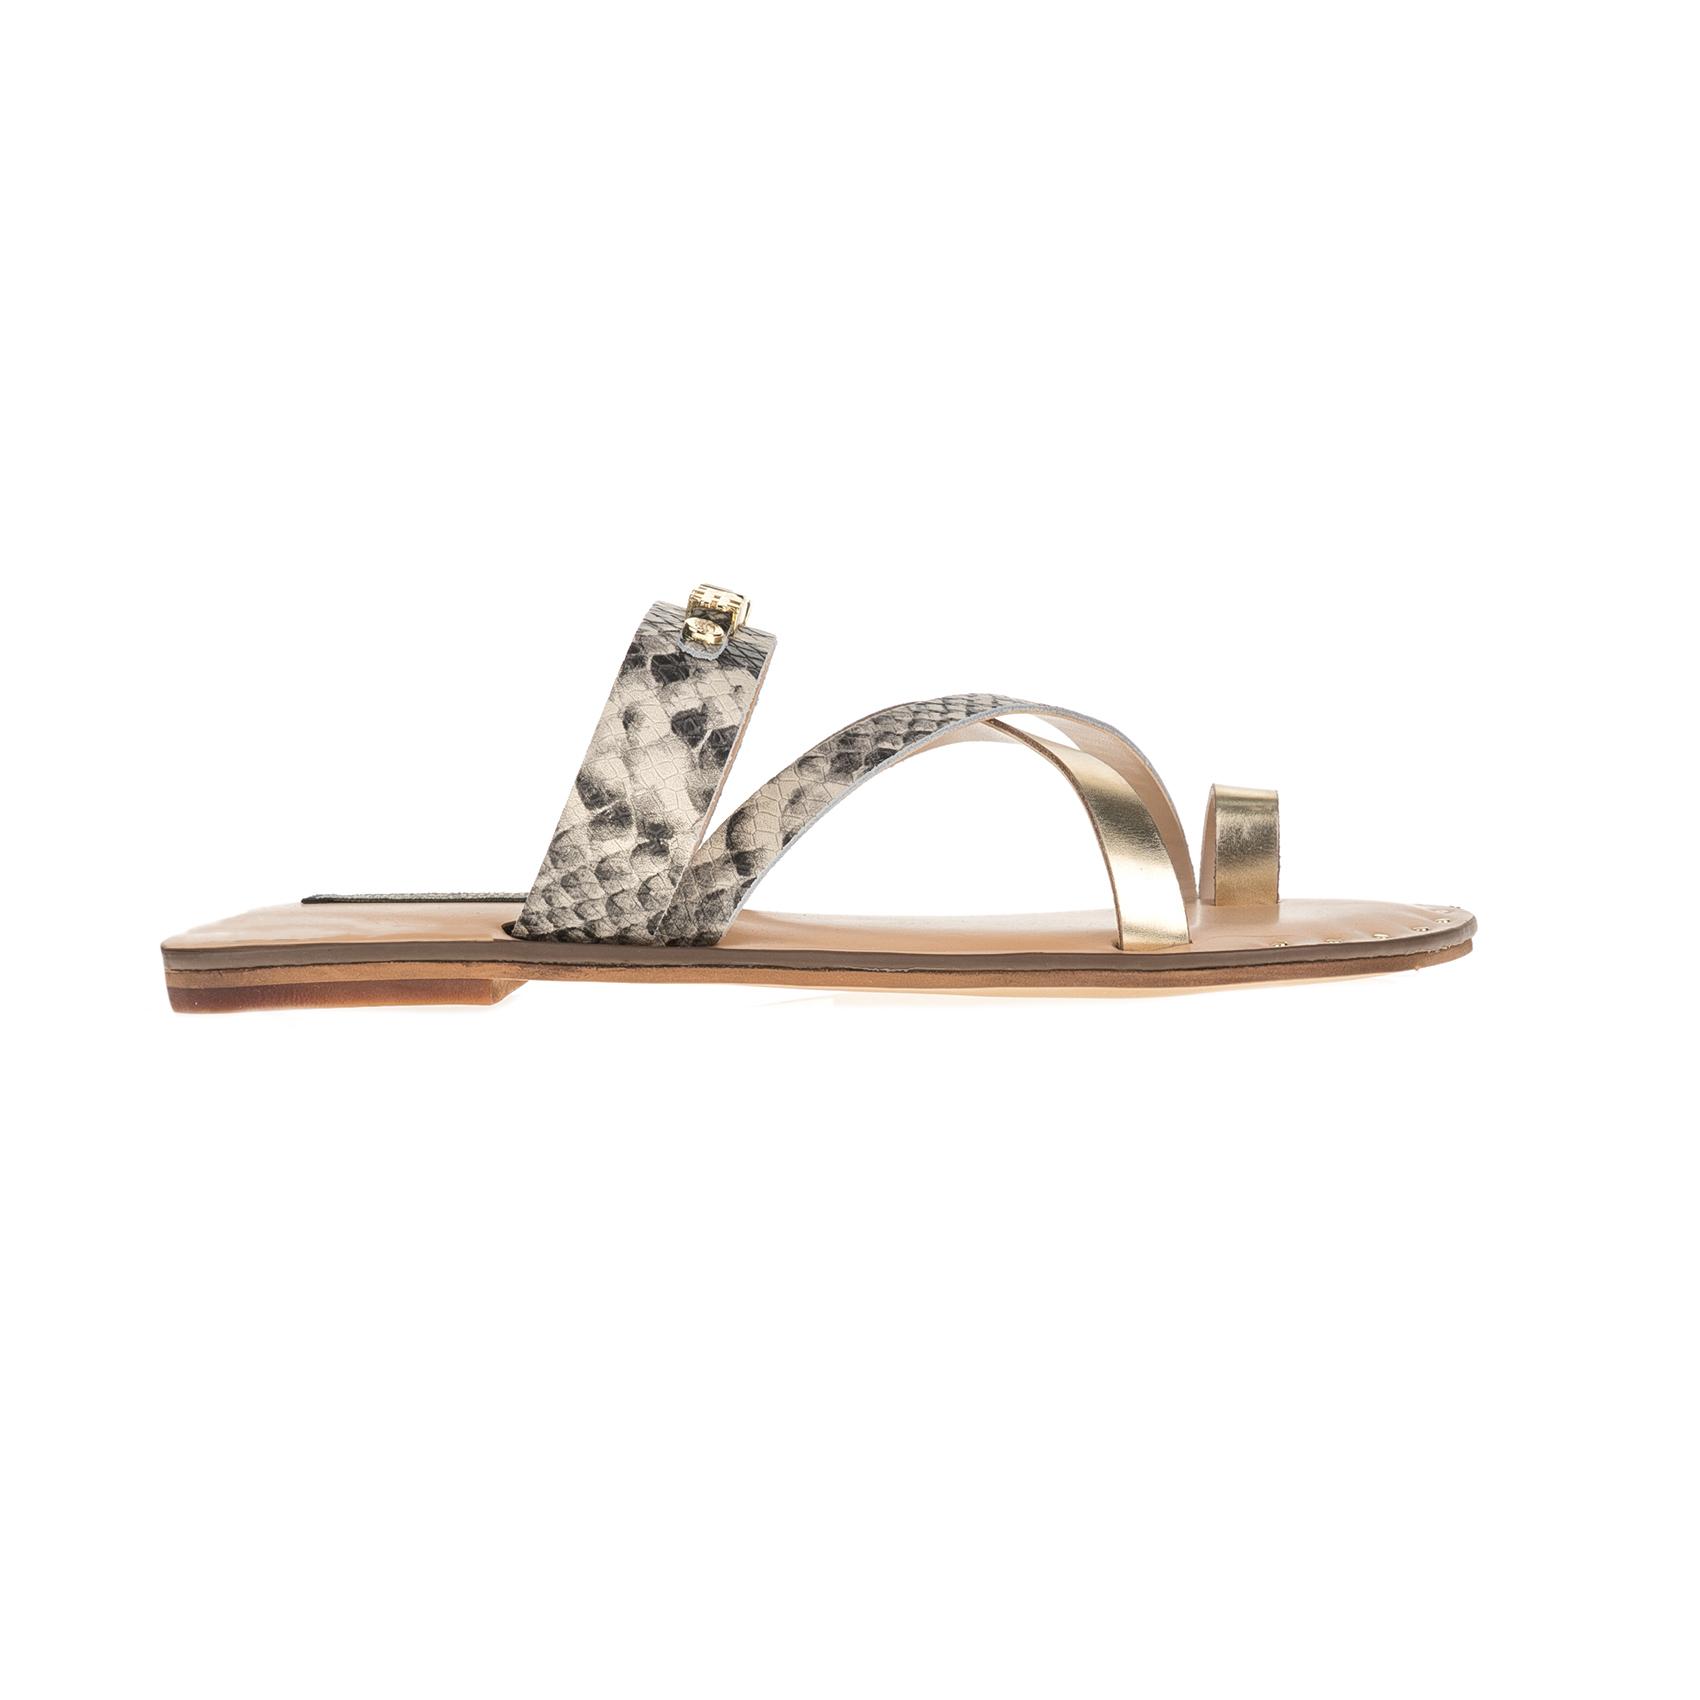 JUICY COUTURE – Γυναικεία σανδάλια JUICY COUTURE PRINCLEY με animal print